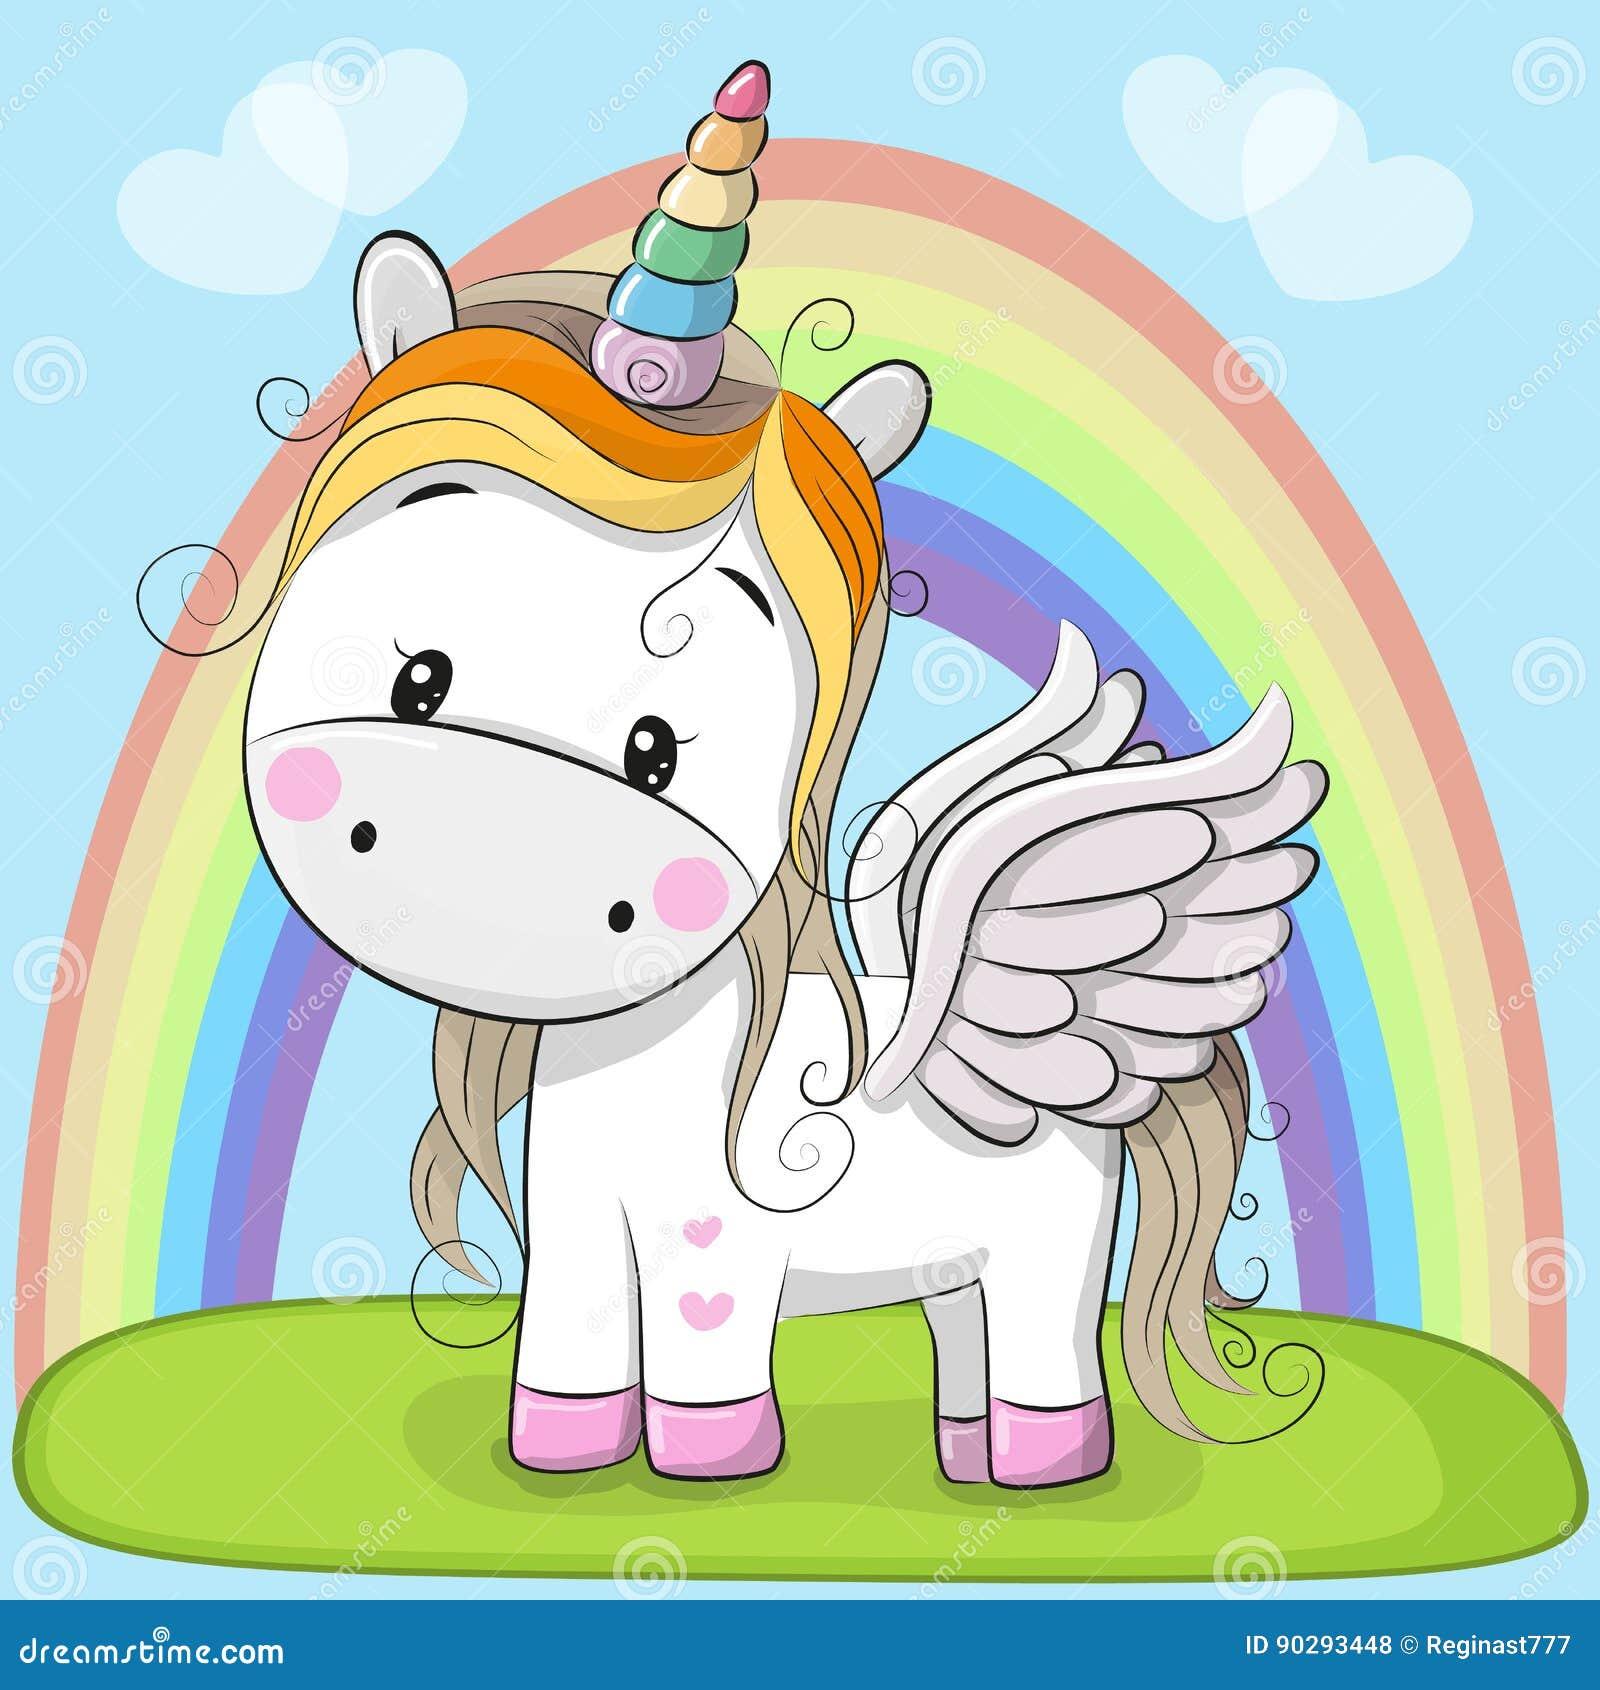 Cute Cartoon Unicorn on the meadow